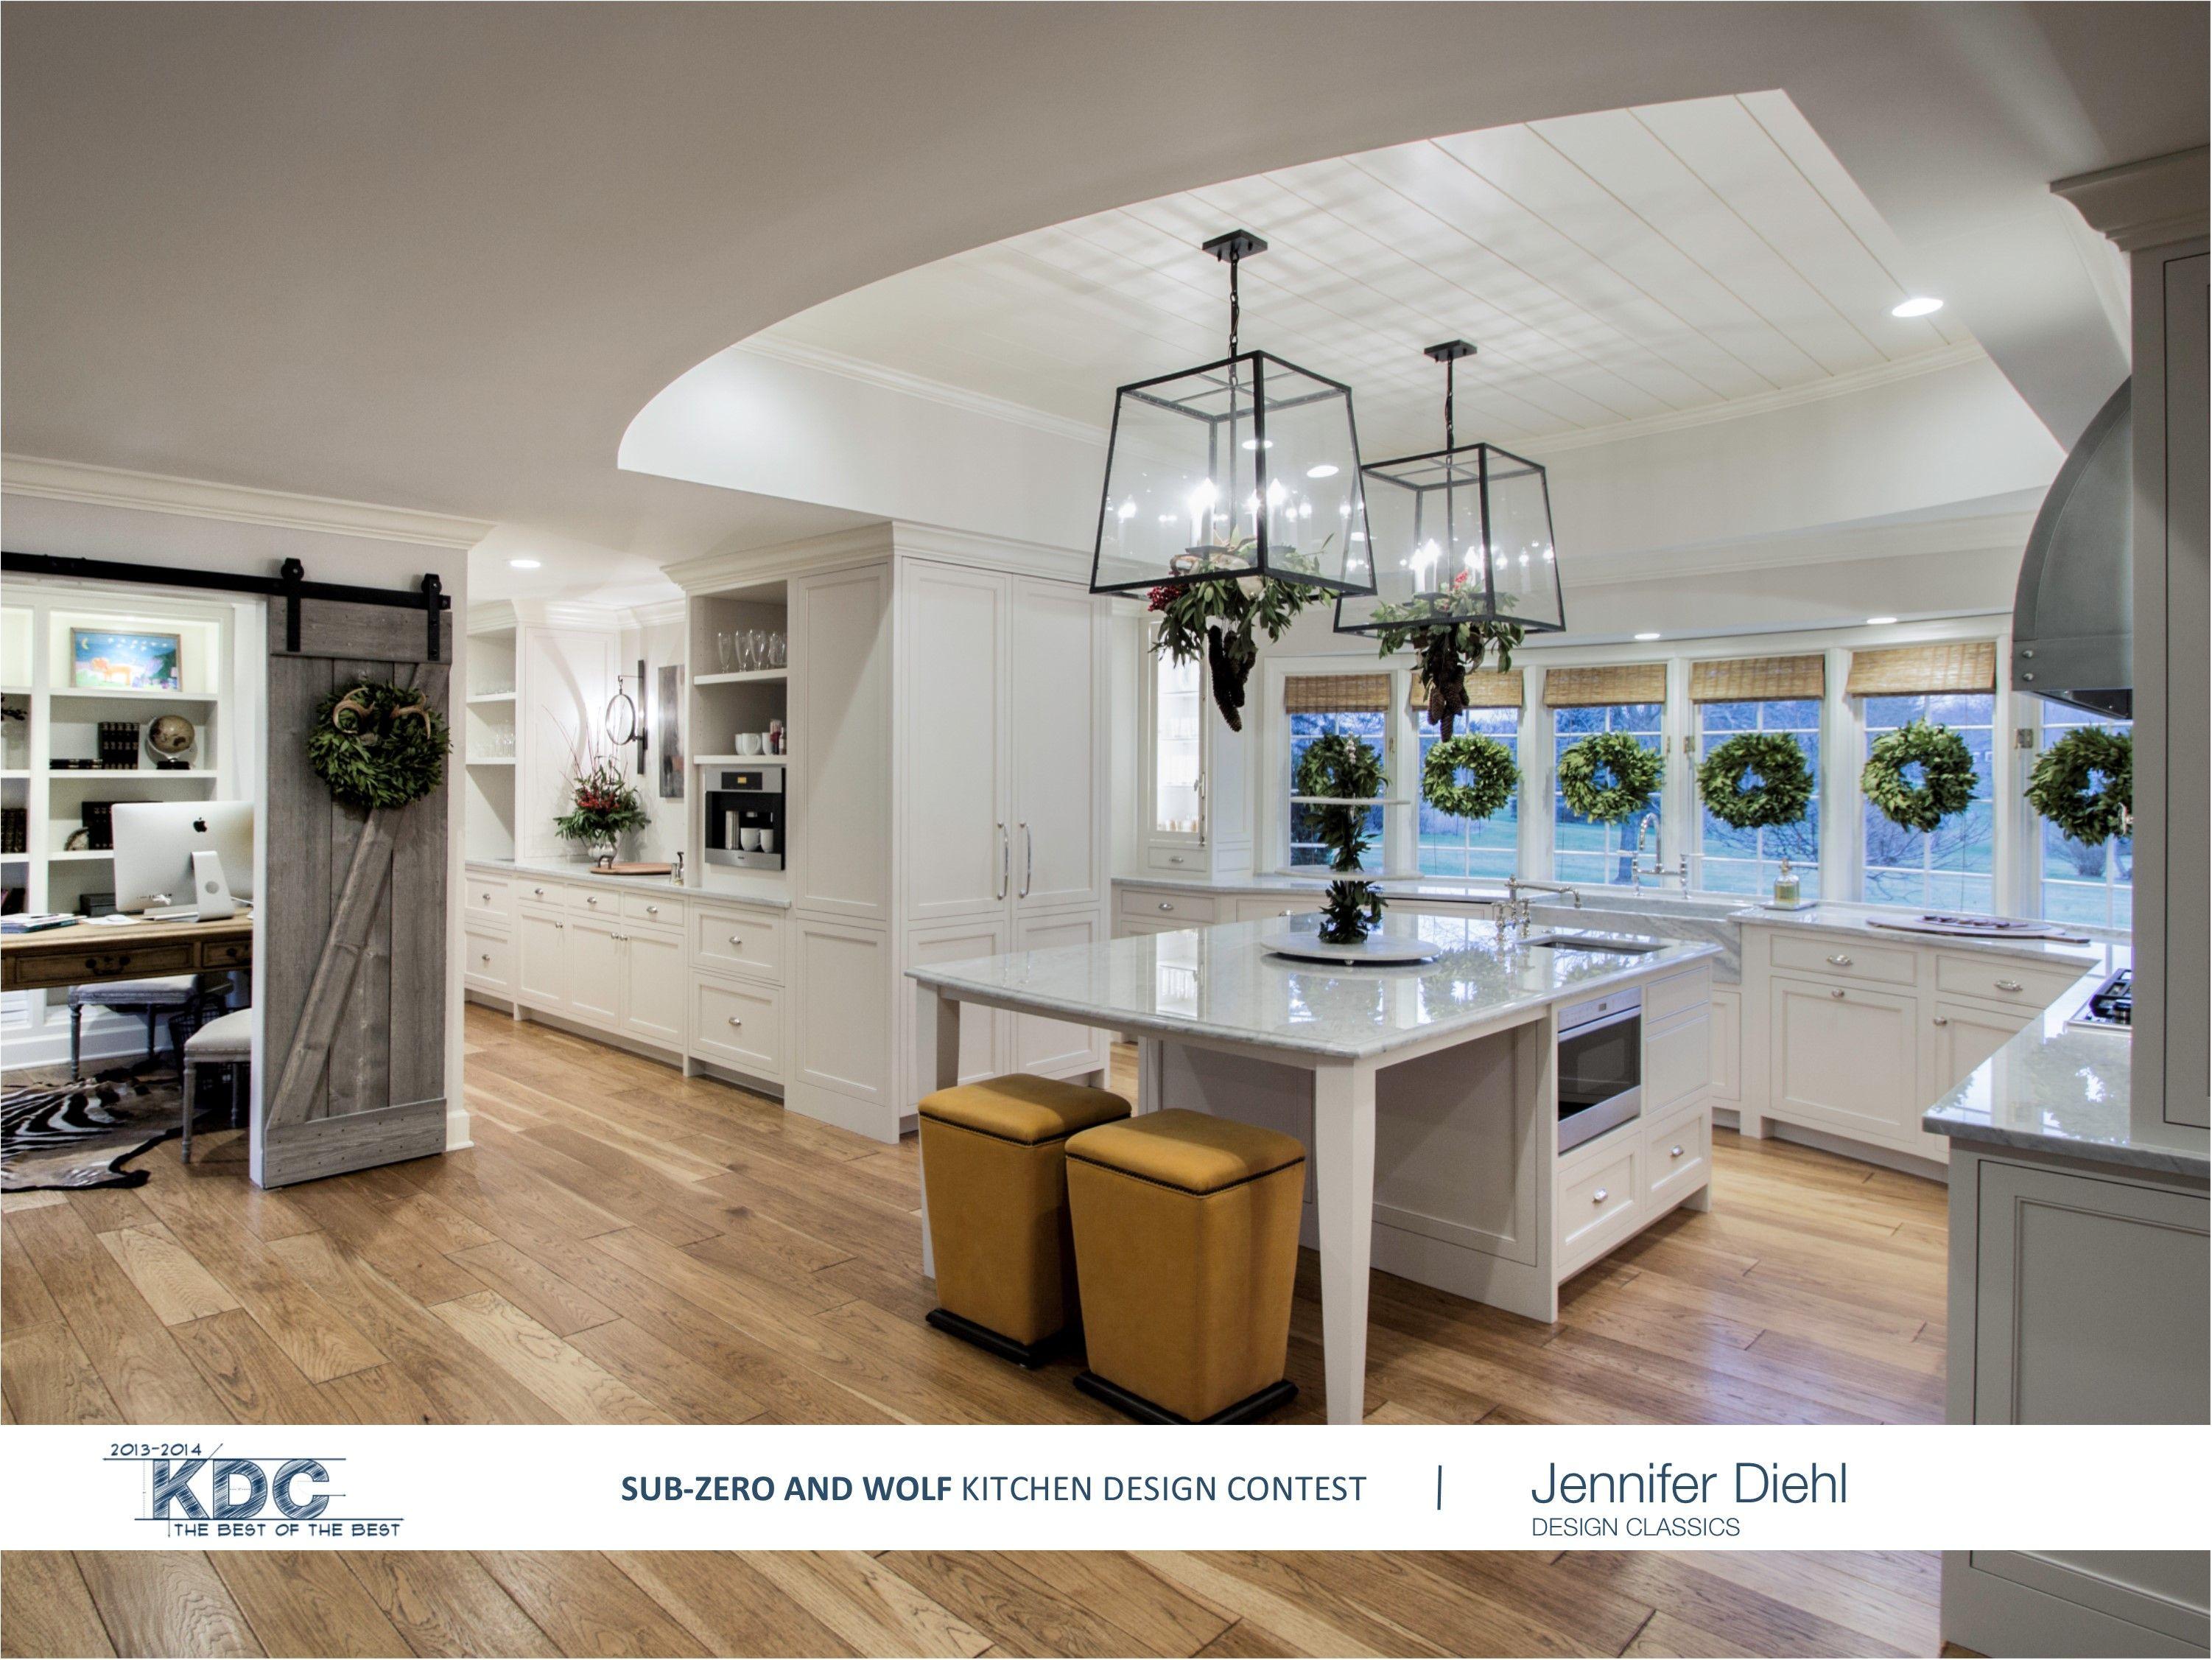 Uncategorized Kitchen Design Contest sub zero and wolf kitchen design contest jennifer diehl designer classics